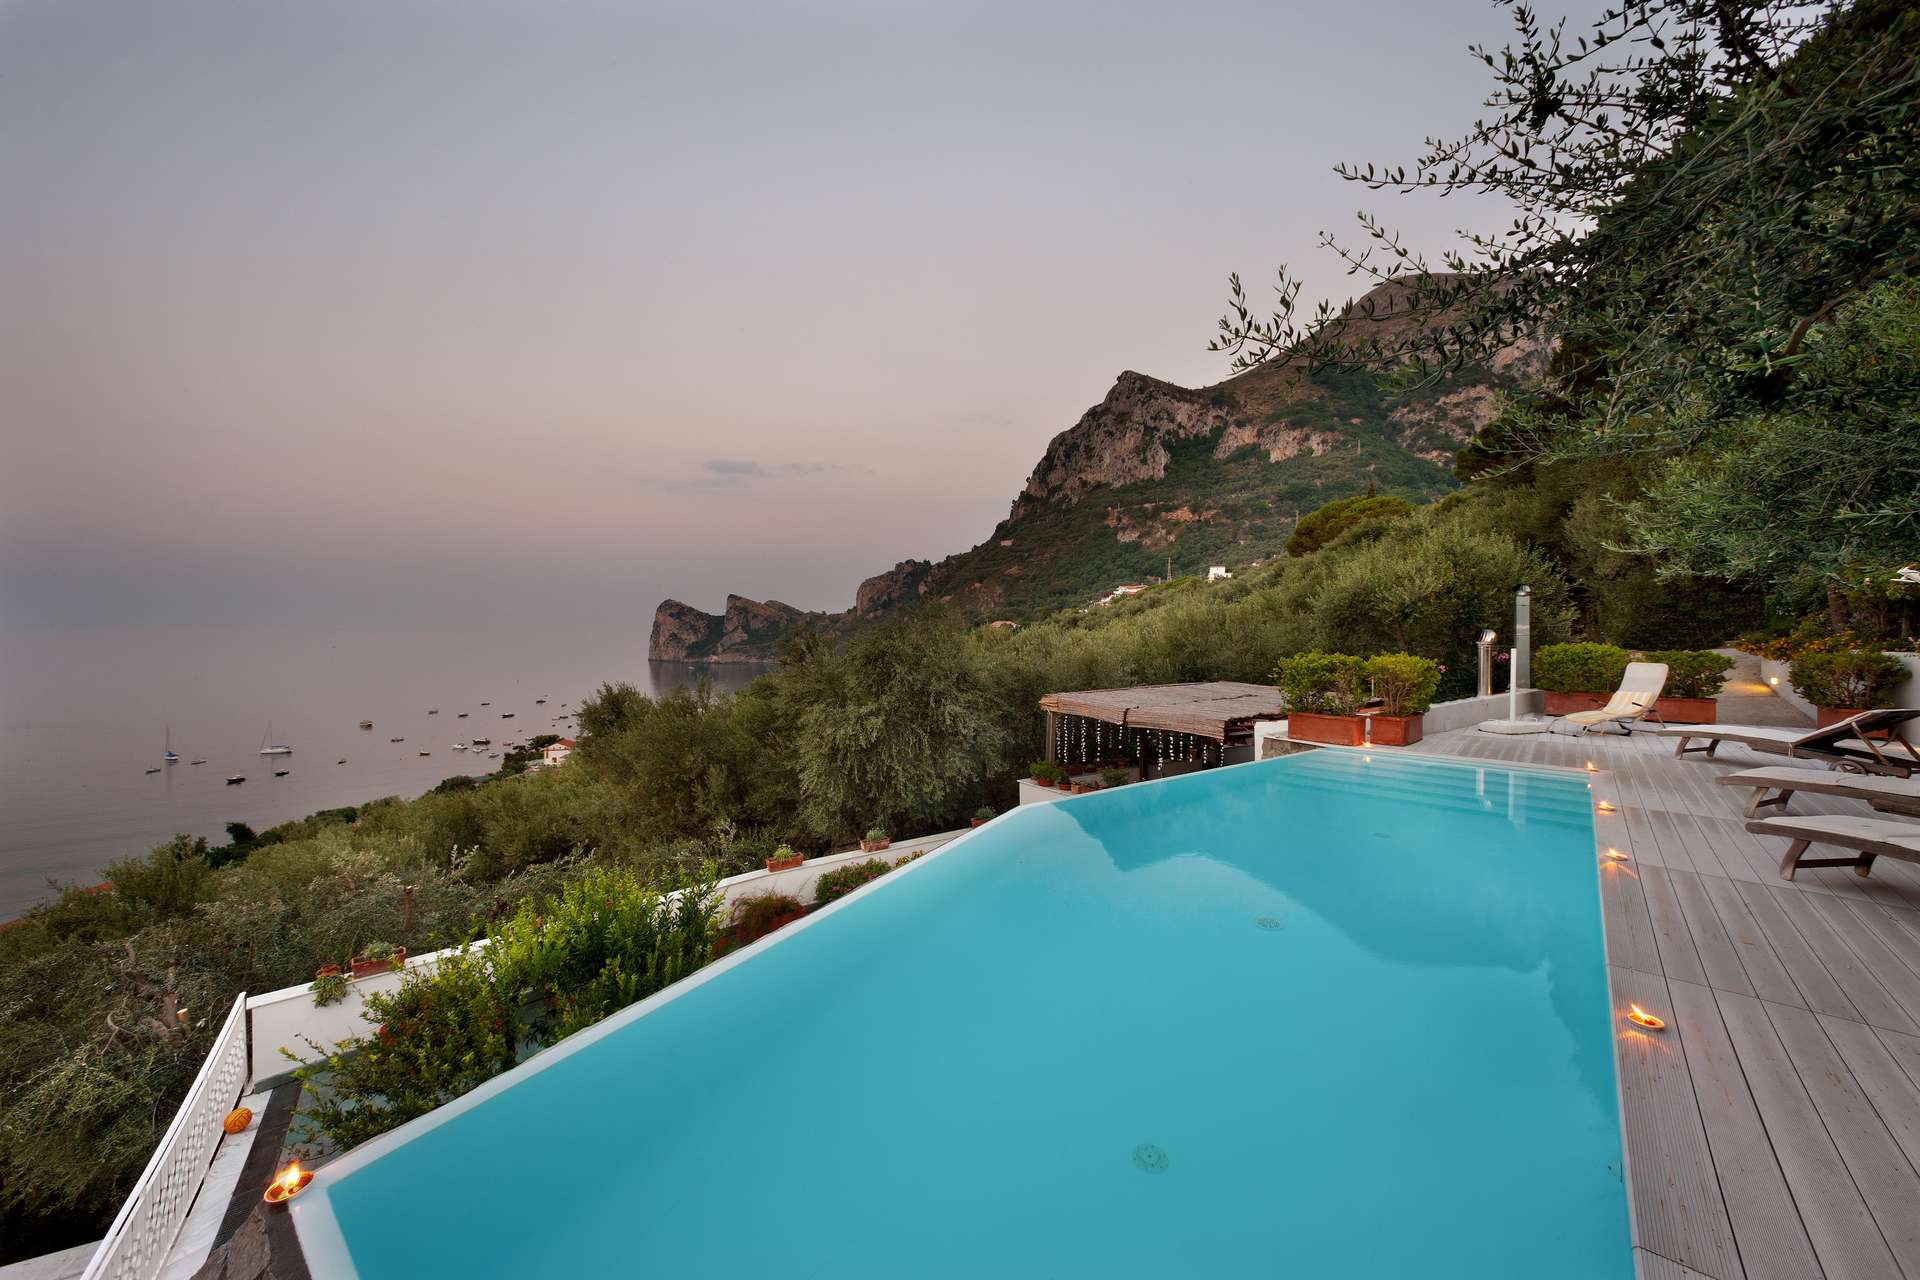 Luxury vacation rentals europe - Italy - Amalfi coast - Sorren to - La Rotonda - Image 1/43